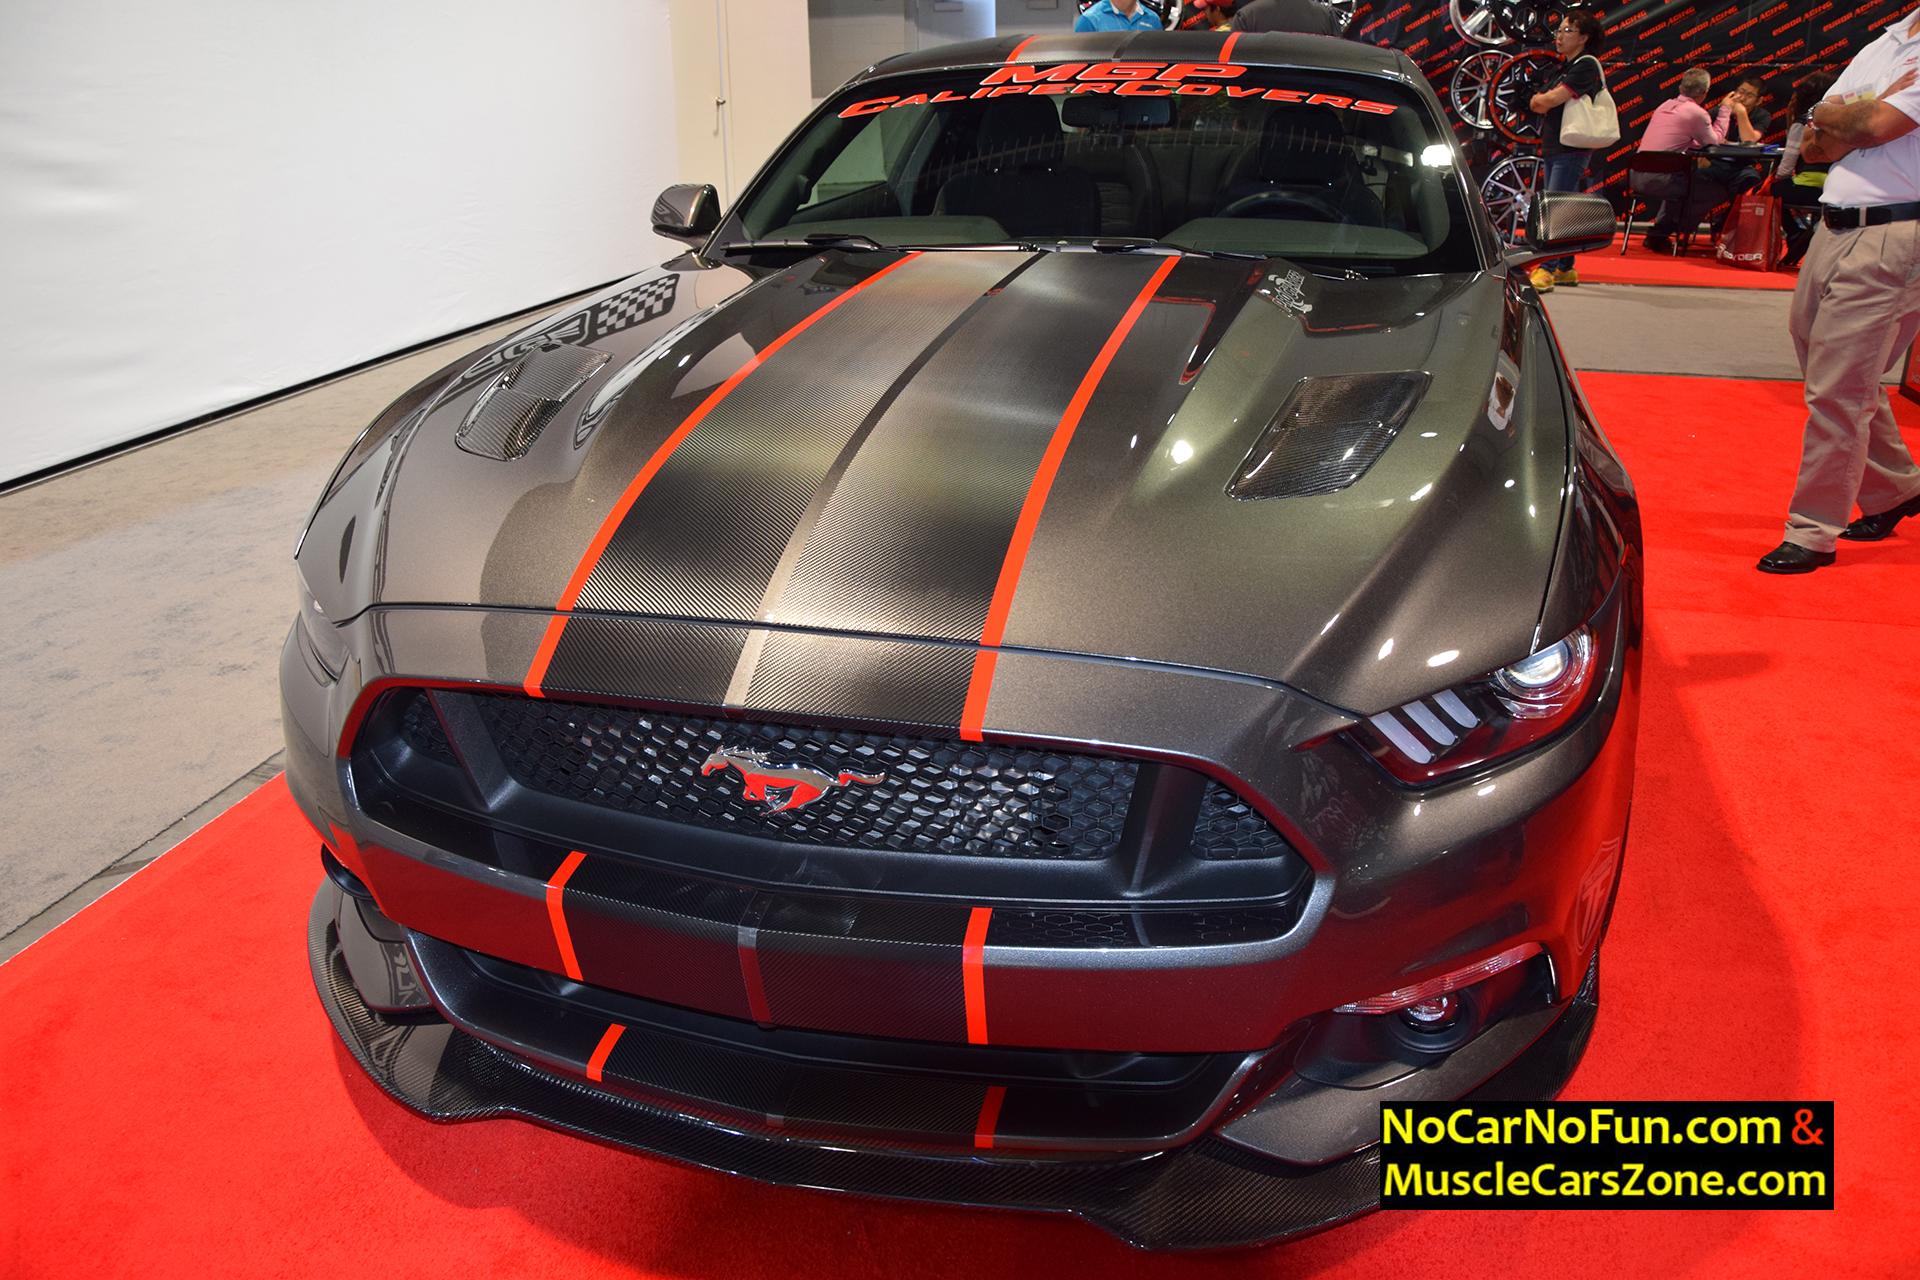 2016 ford mustang gt 5 0 mgp caliper covers 2015 sema motor show 3 no car no fun muscle. Black Bedroom Furniture Sets. Home Design Ideas